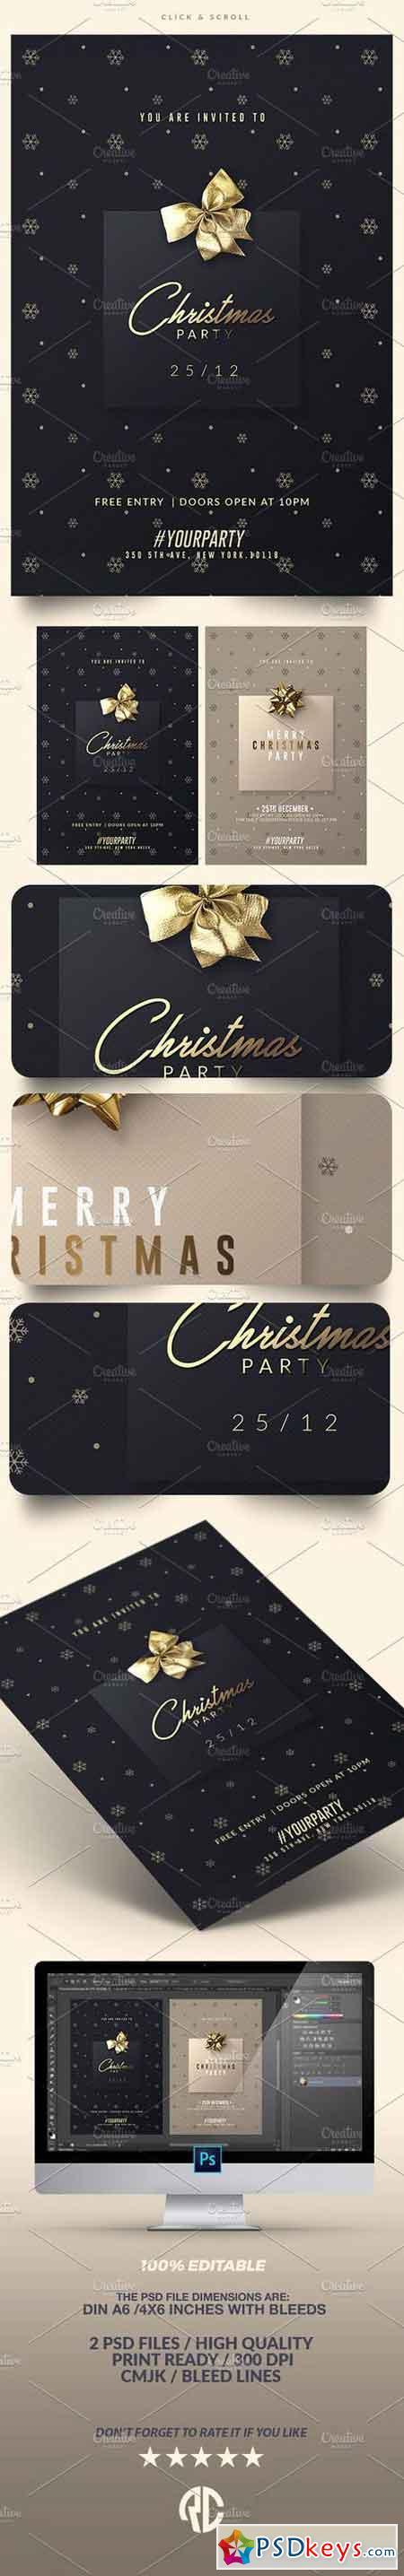 classy christmas invitations